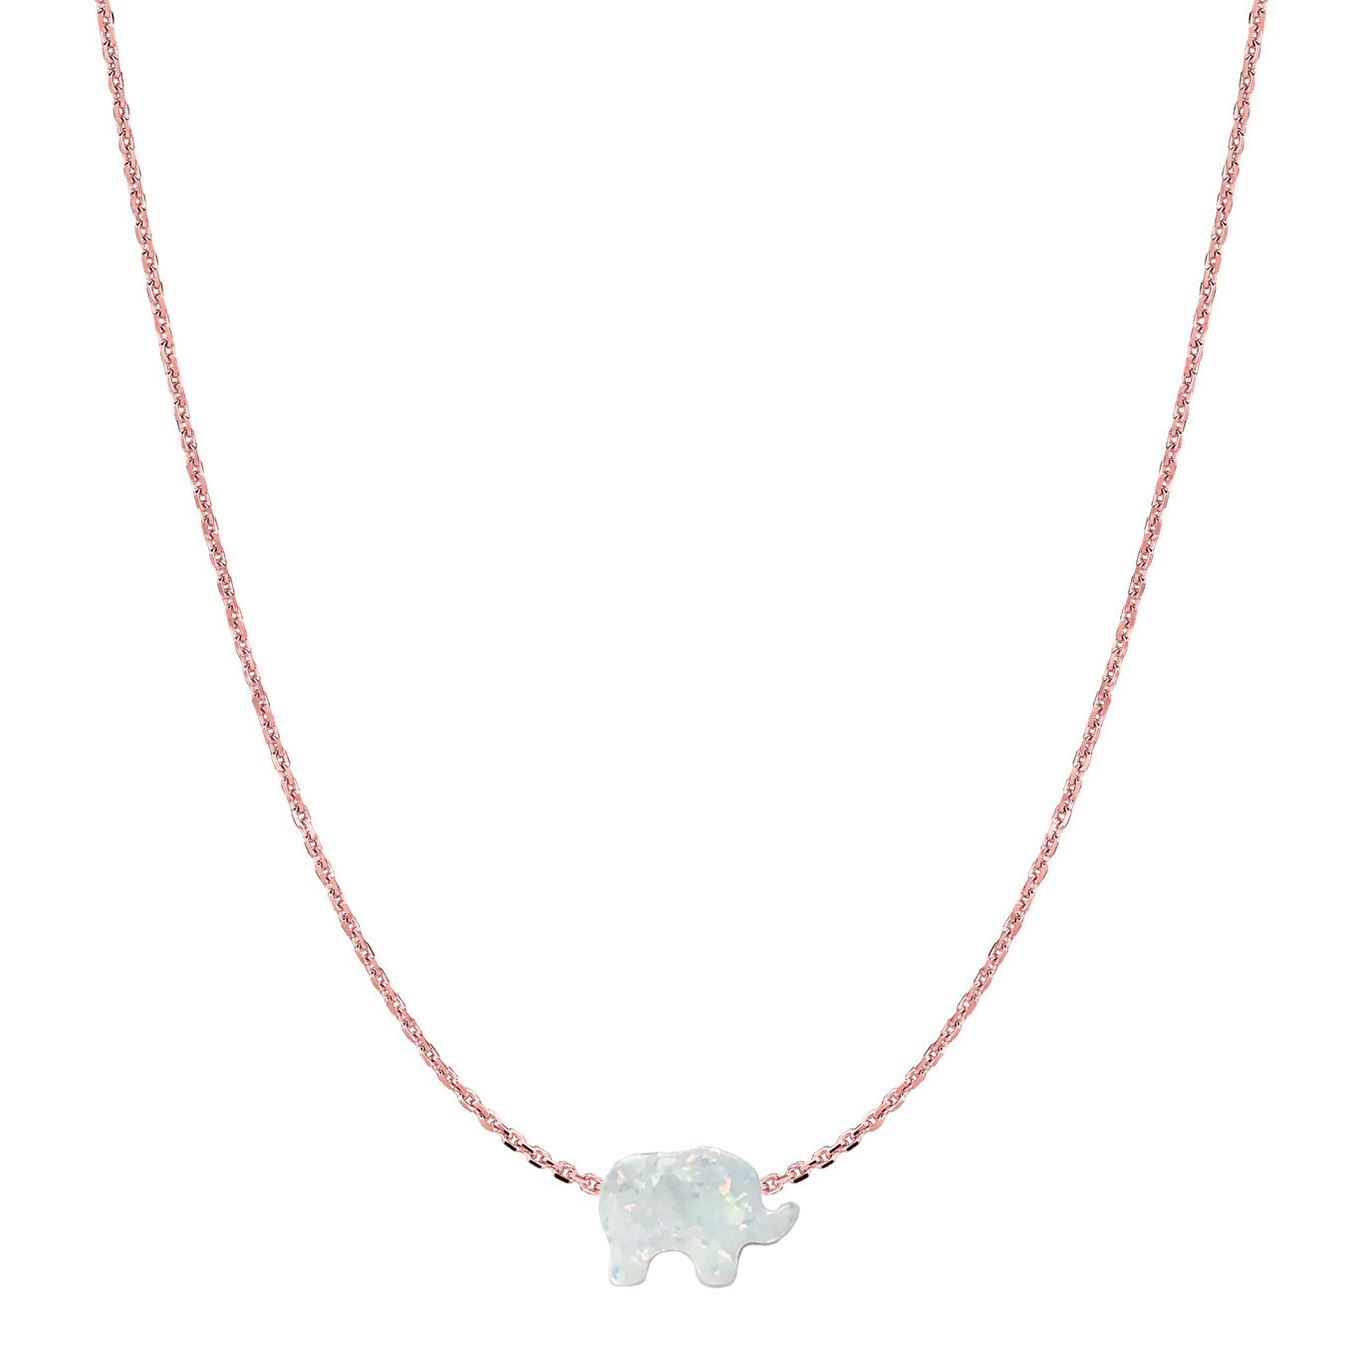 14 Karat Gold Pure White Opal Elephant Necklace